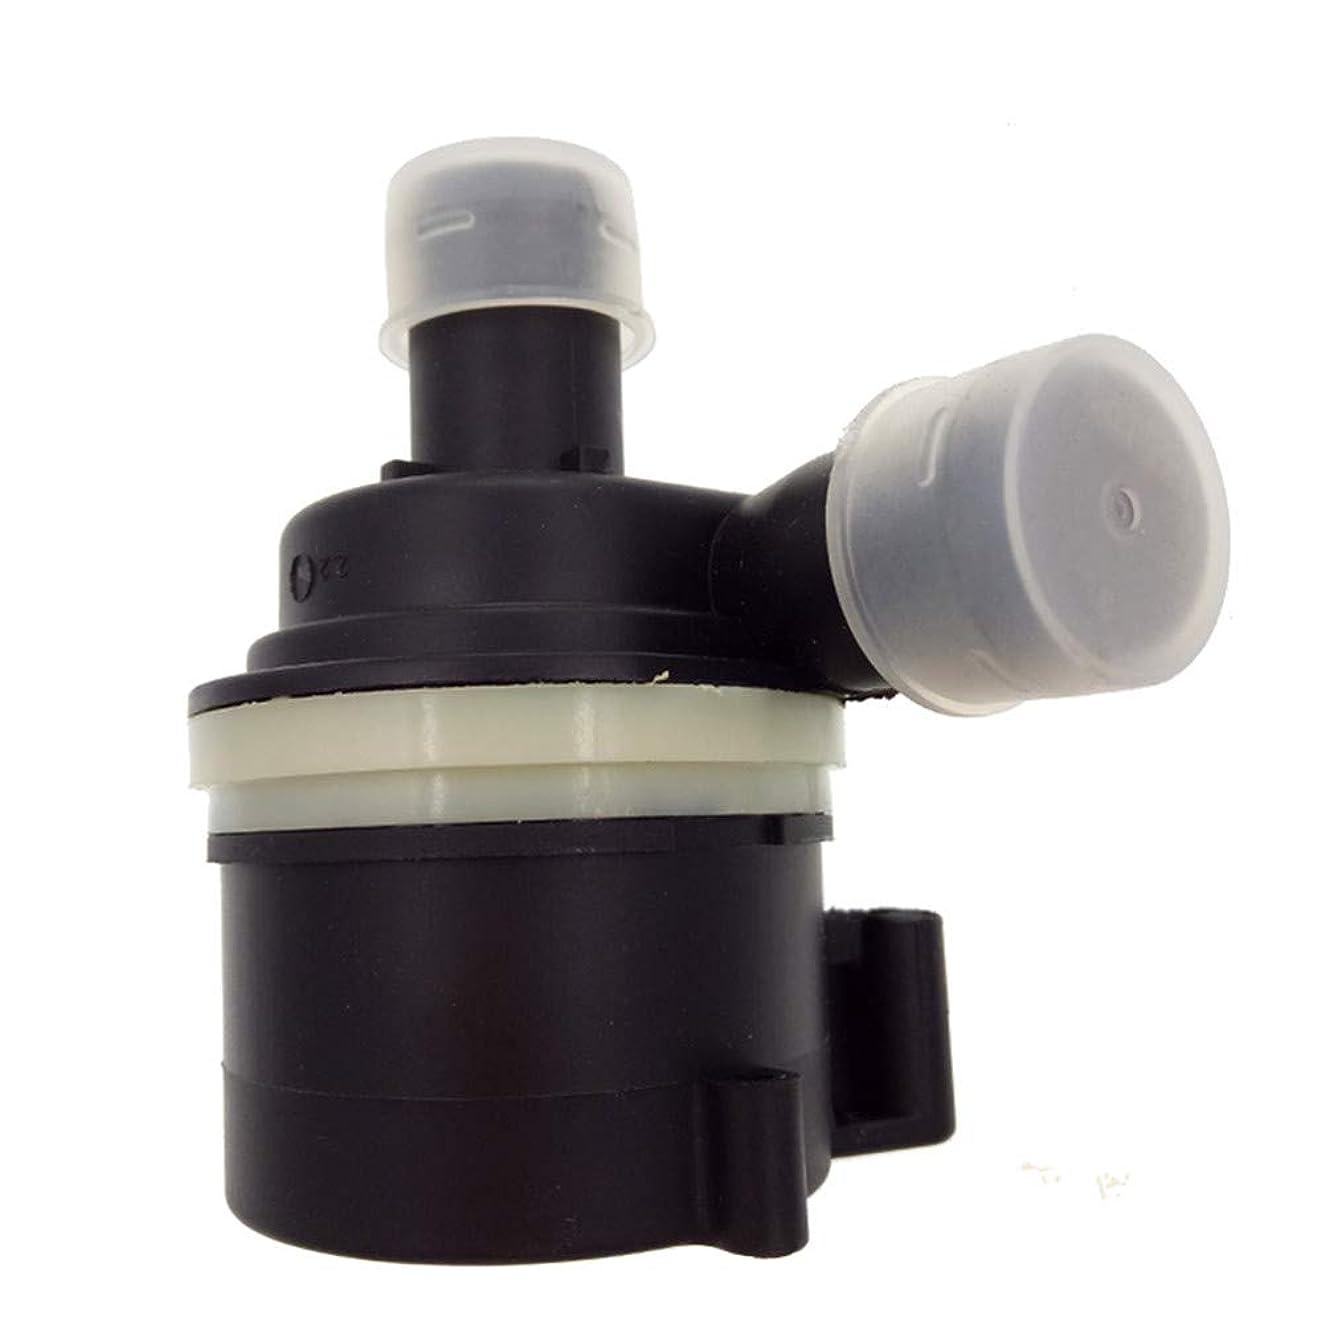 059121012B Car Additional Auxiliary Coolant Water Pump for Volkswagen VW Amarok Touareg Audi A4 A5 A6 Avant Q5 Q7 059 121 012B